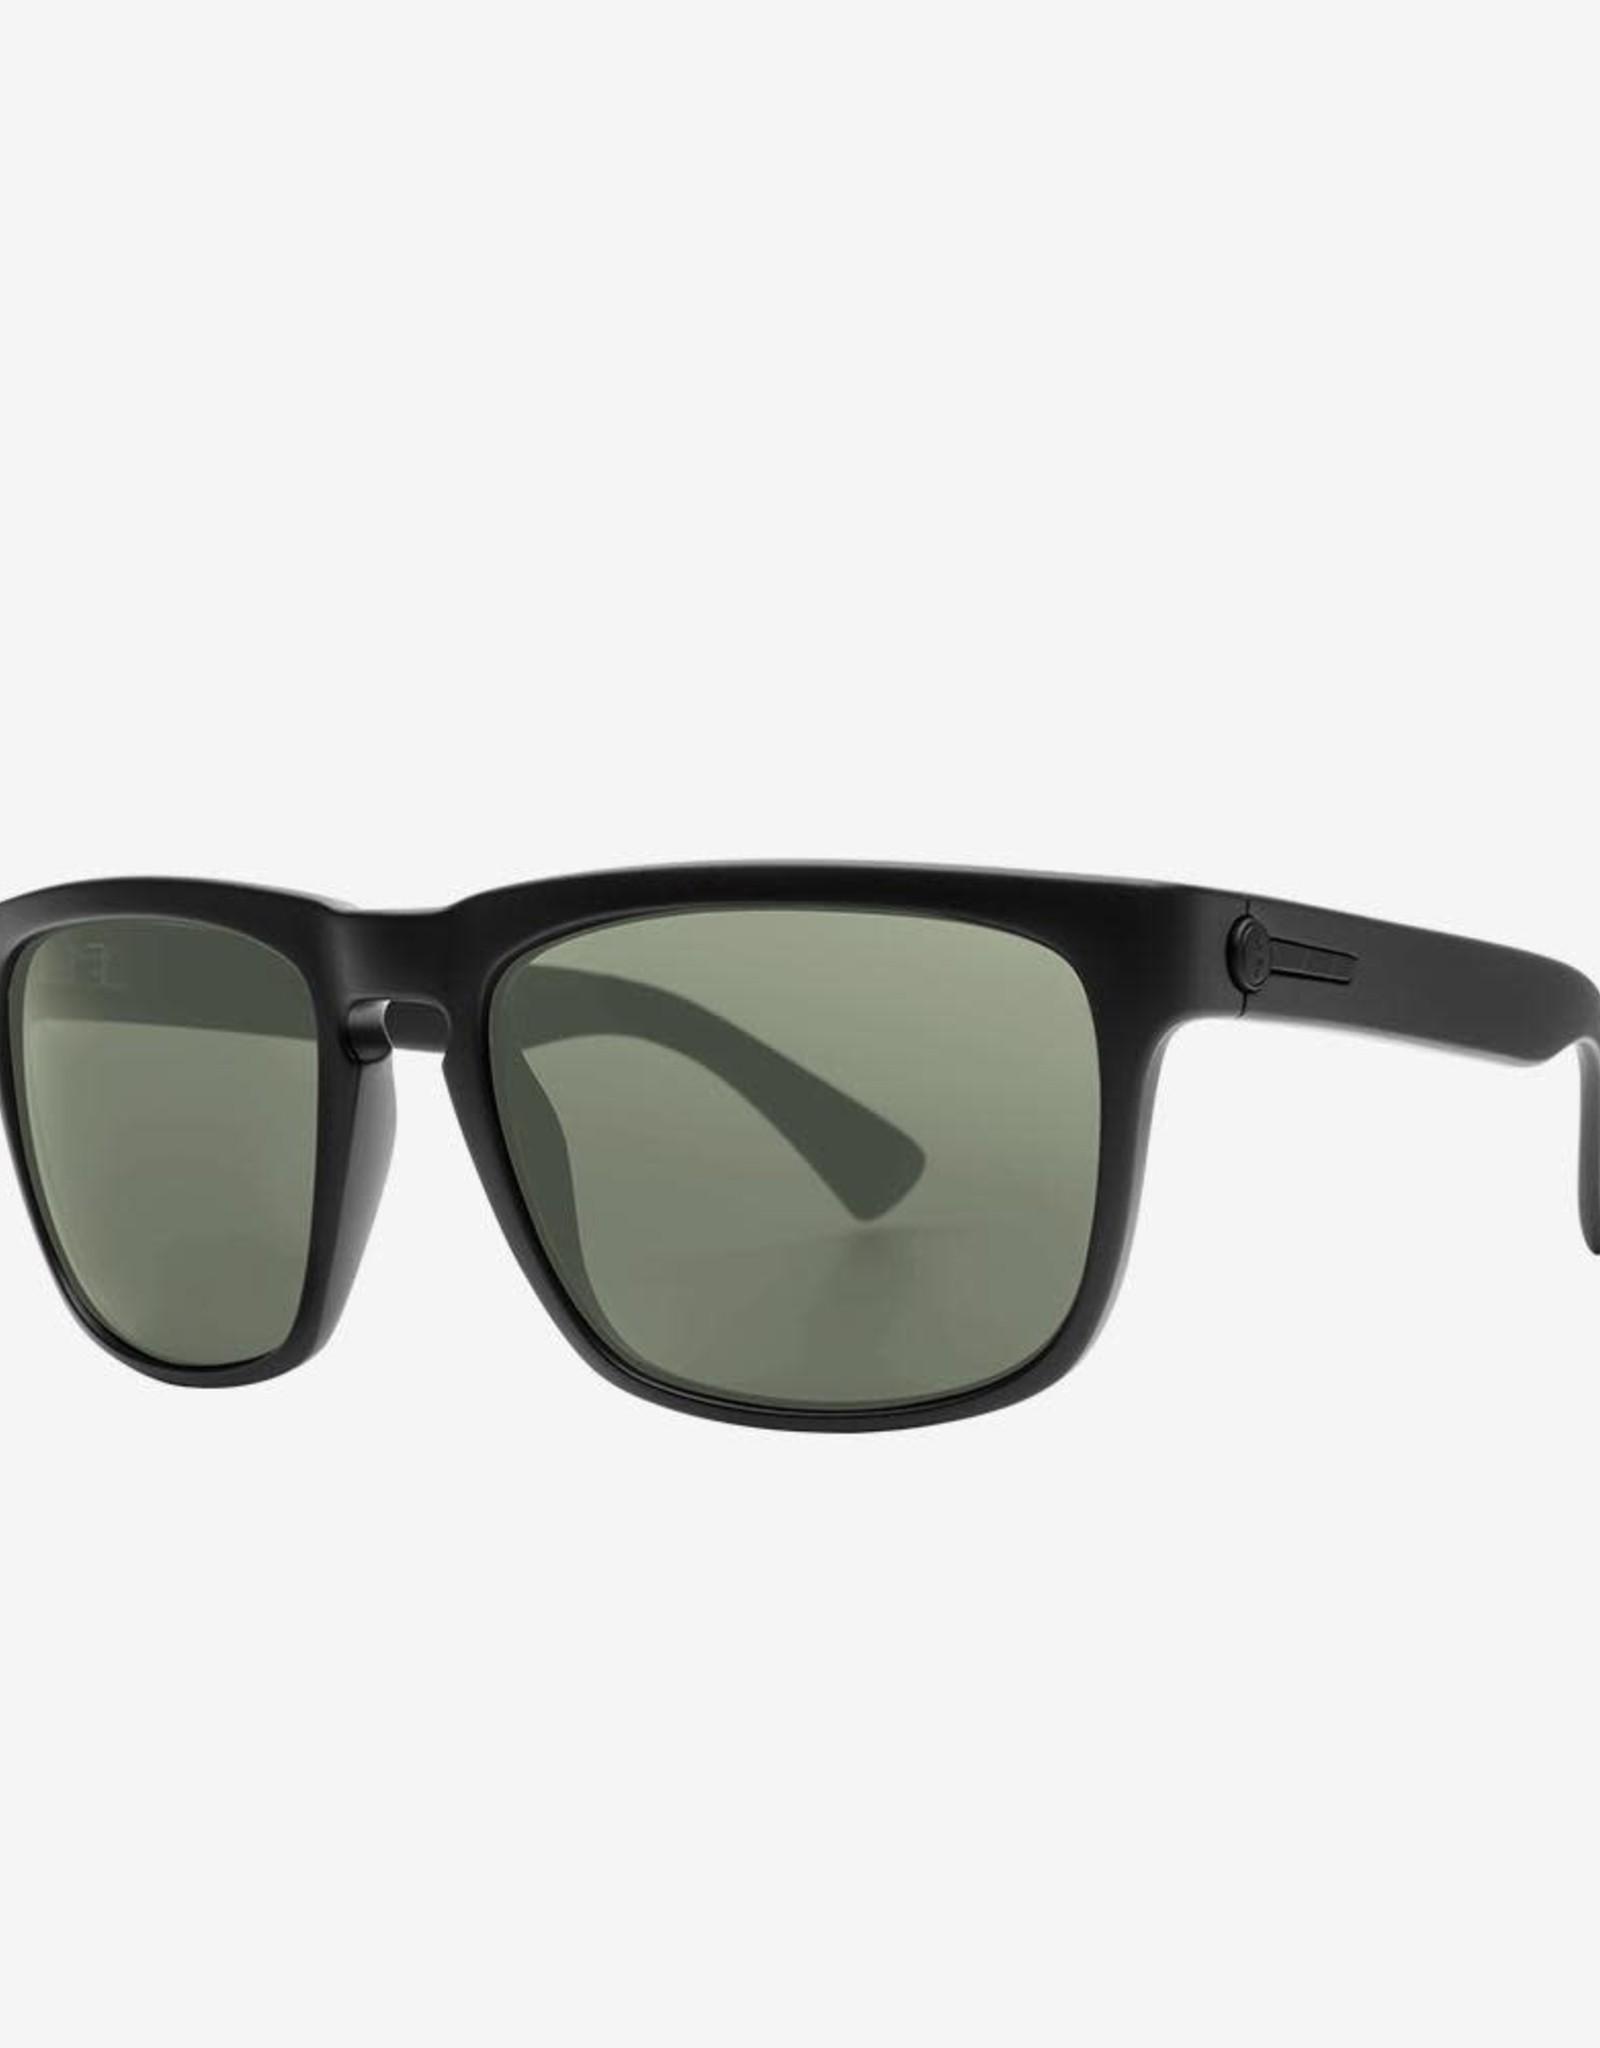 Electric Visual Electric - KNOXVILLE XL - Matte Black w/ POLAR Grey